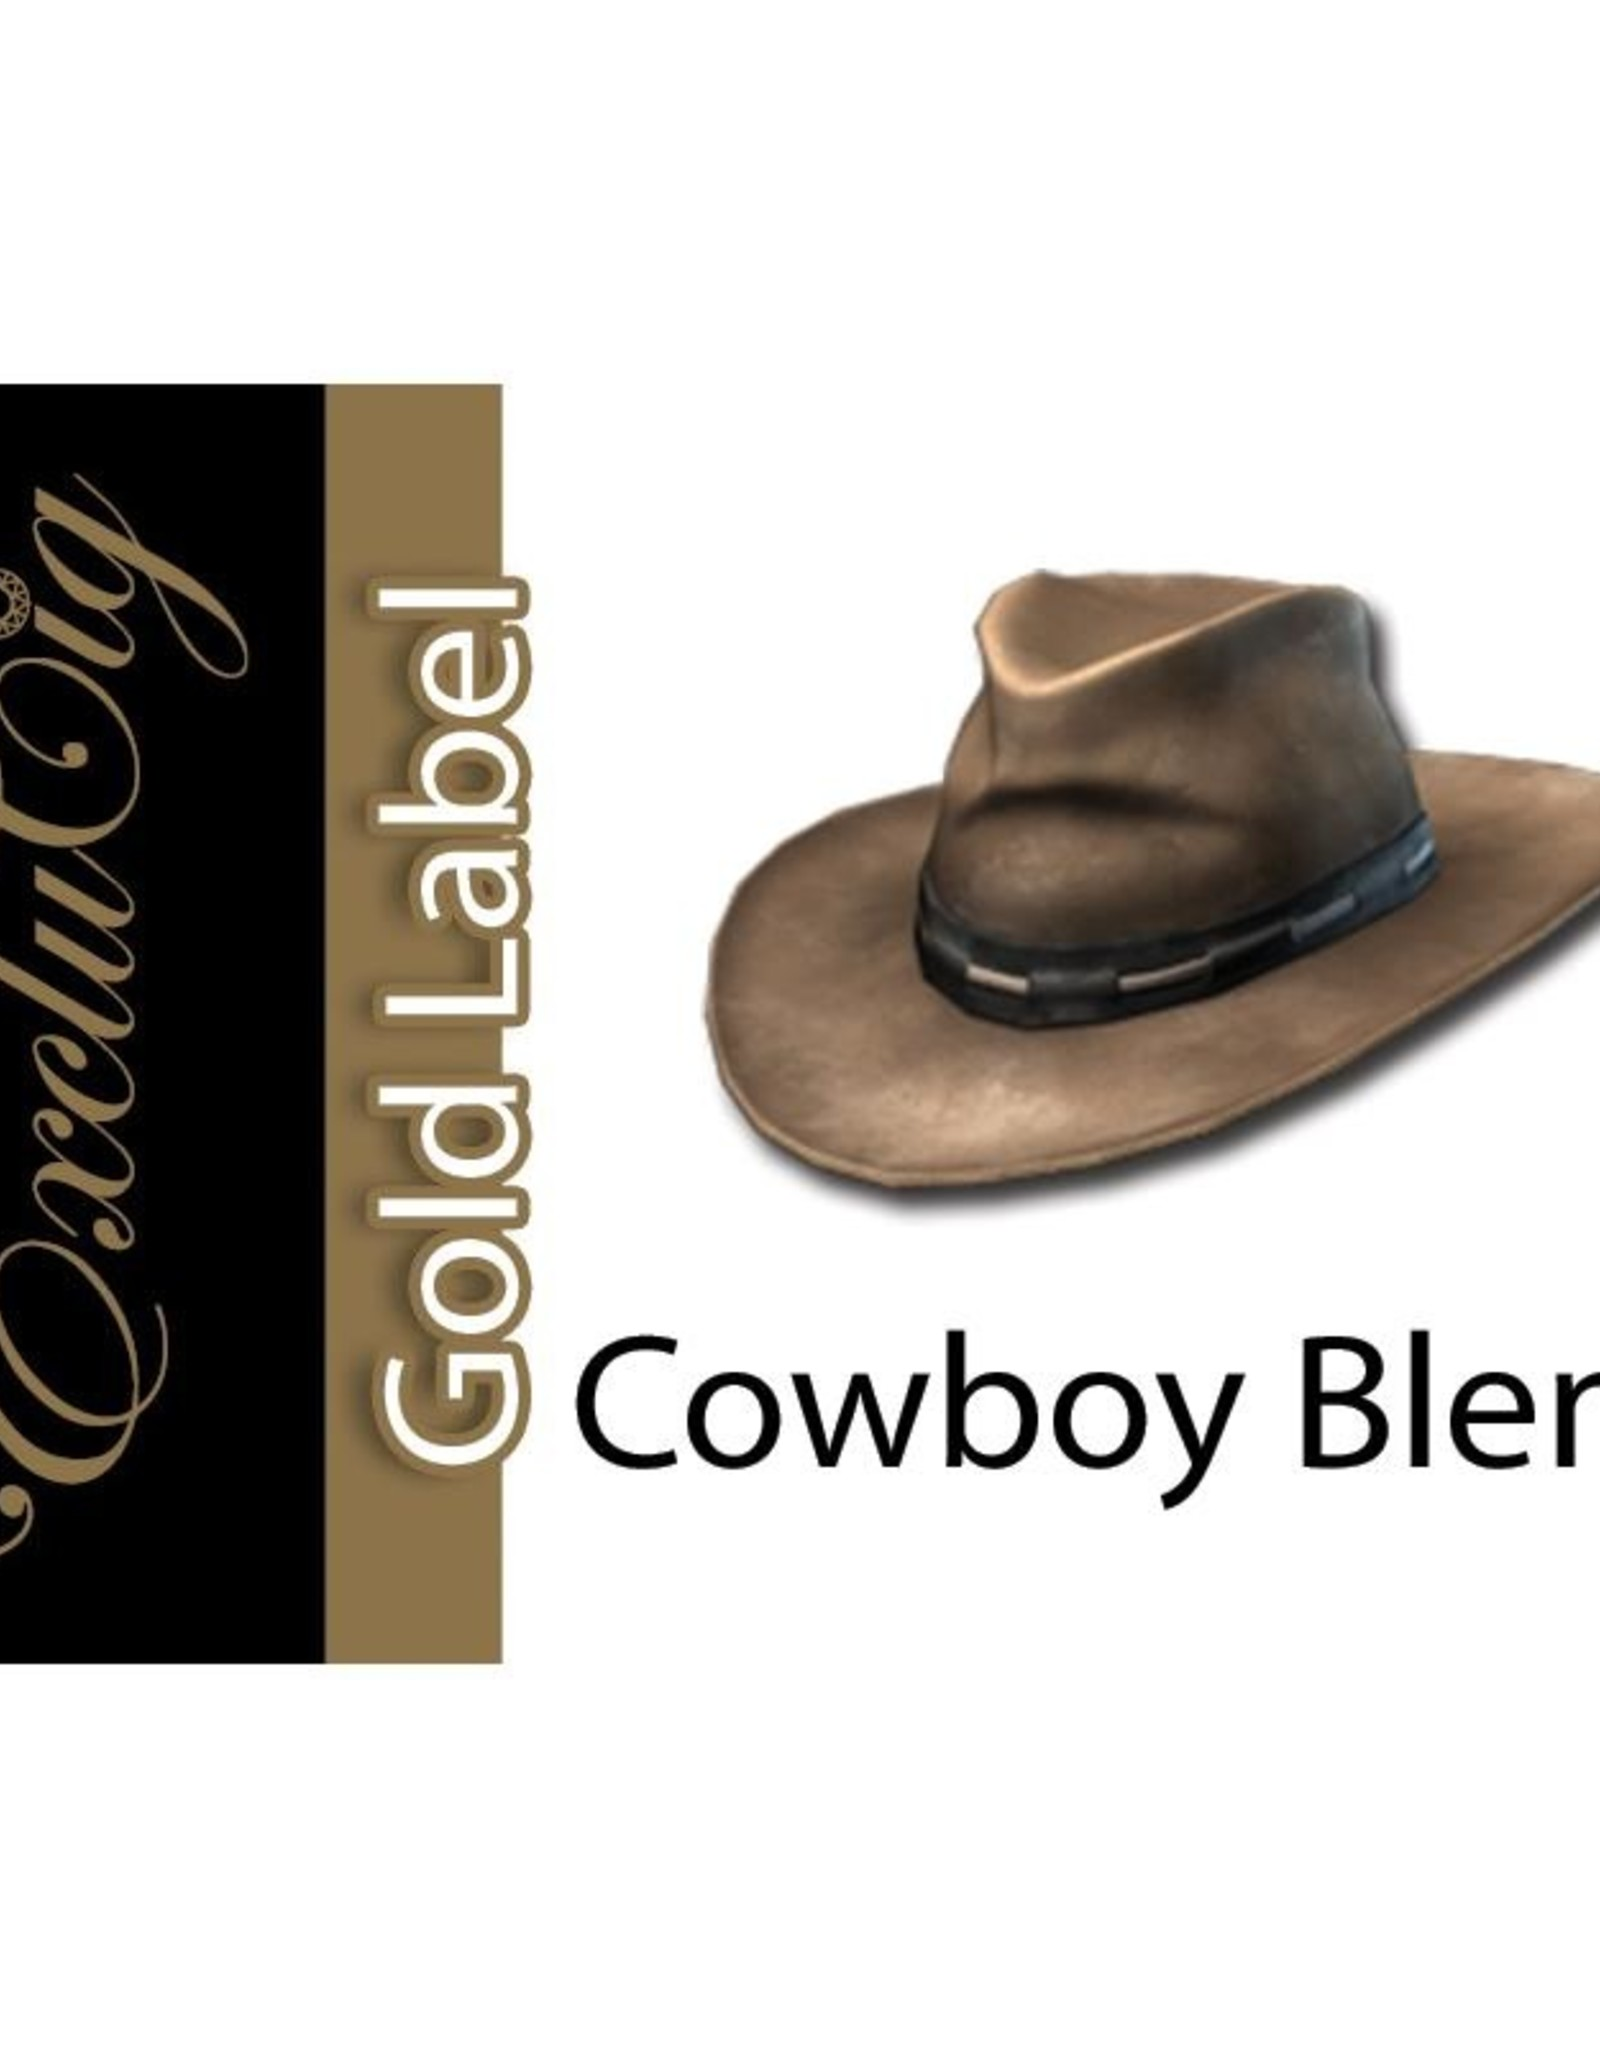 Exclucig Exclucig Gold Label E-liquid Cowboy Blend 18 mg Nicotine